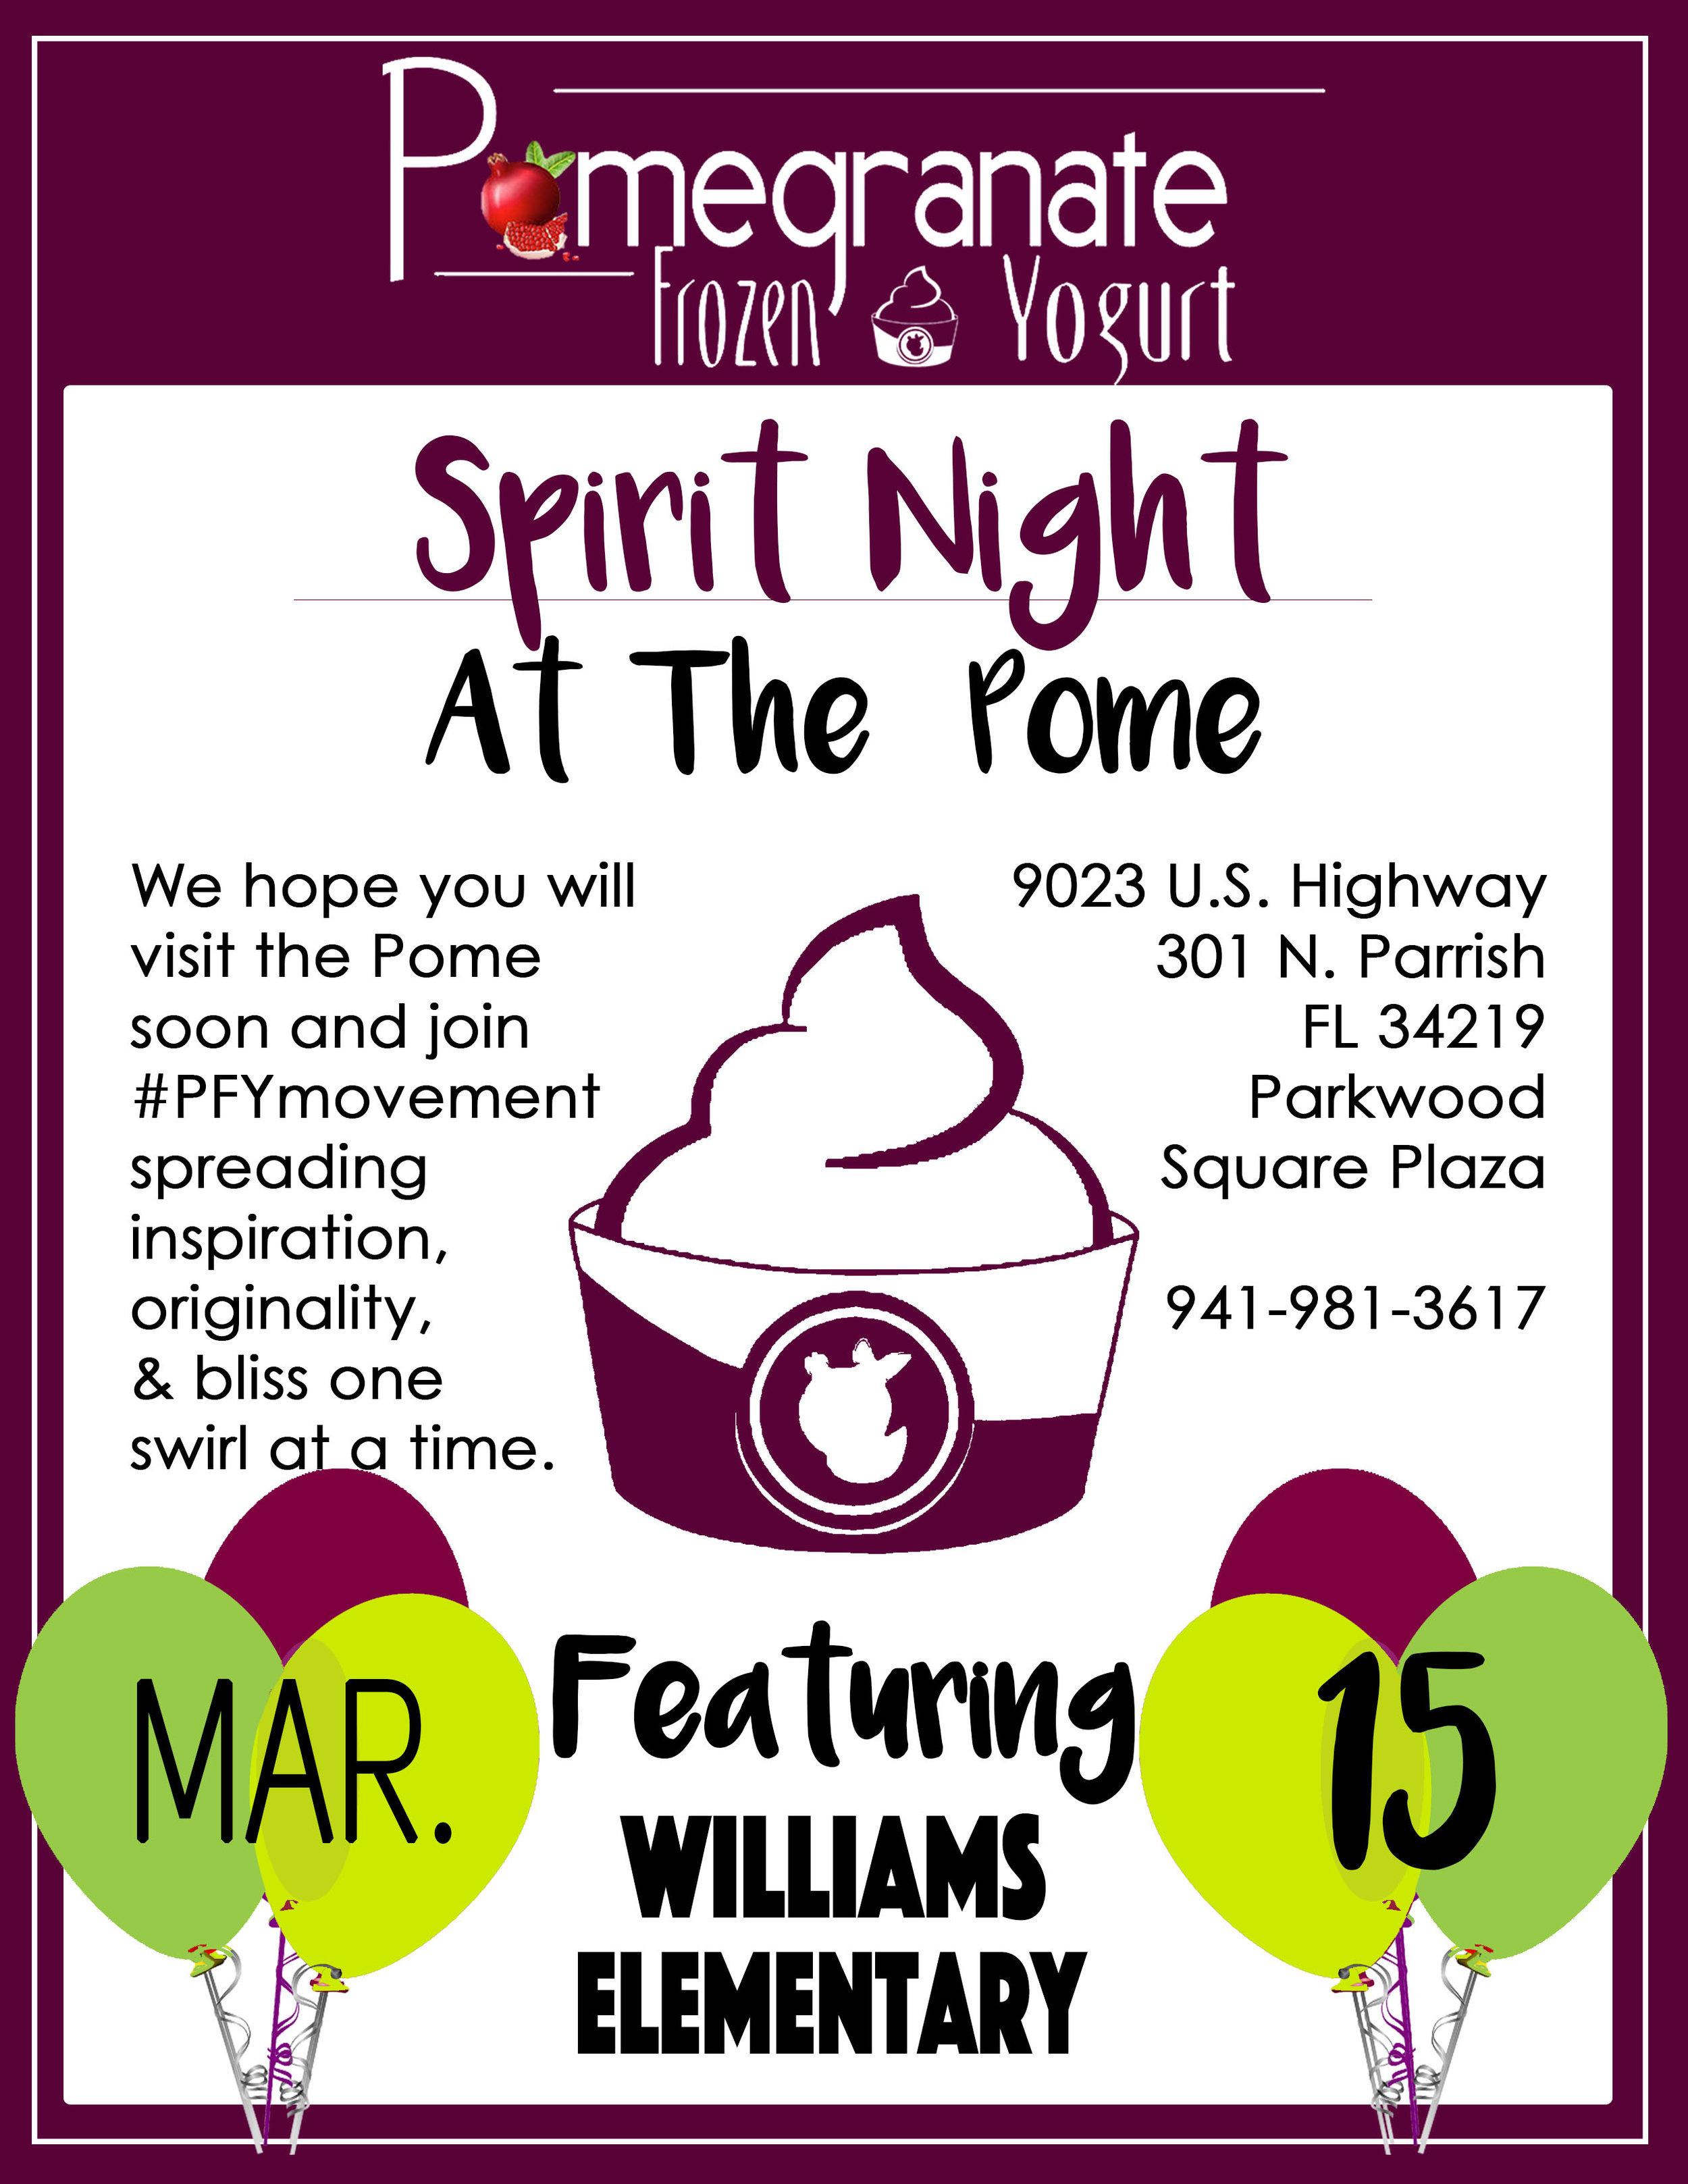 Williams_little spirit night_Mar_2018_Gary.jpg